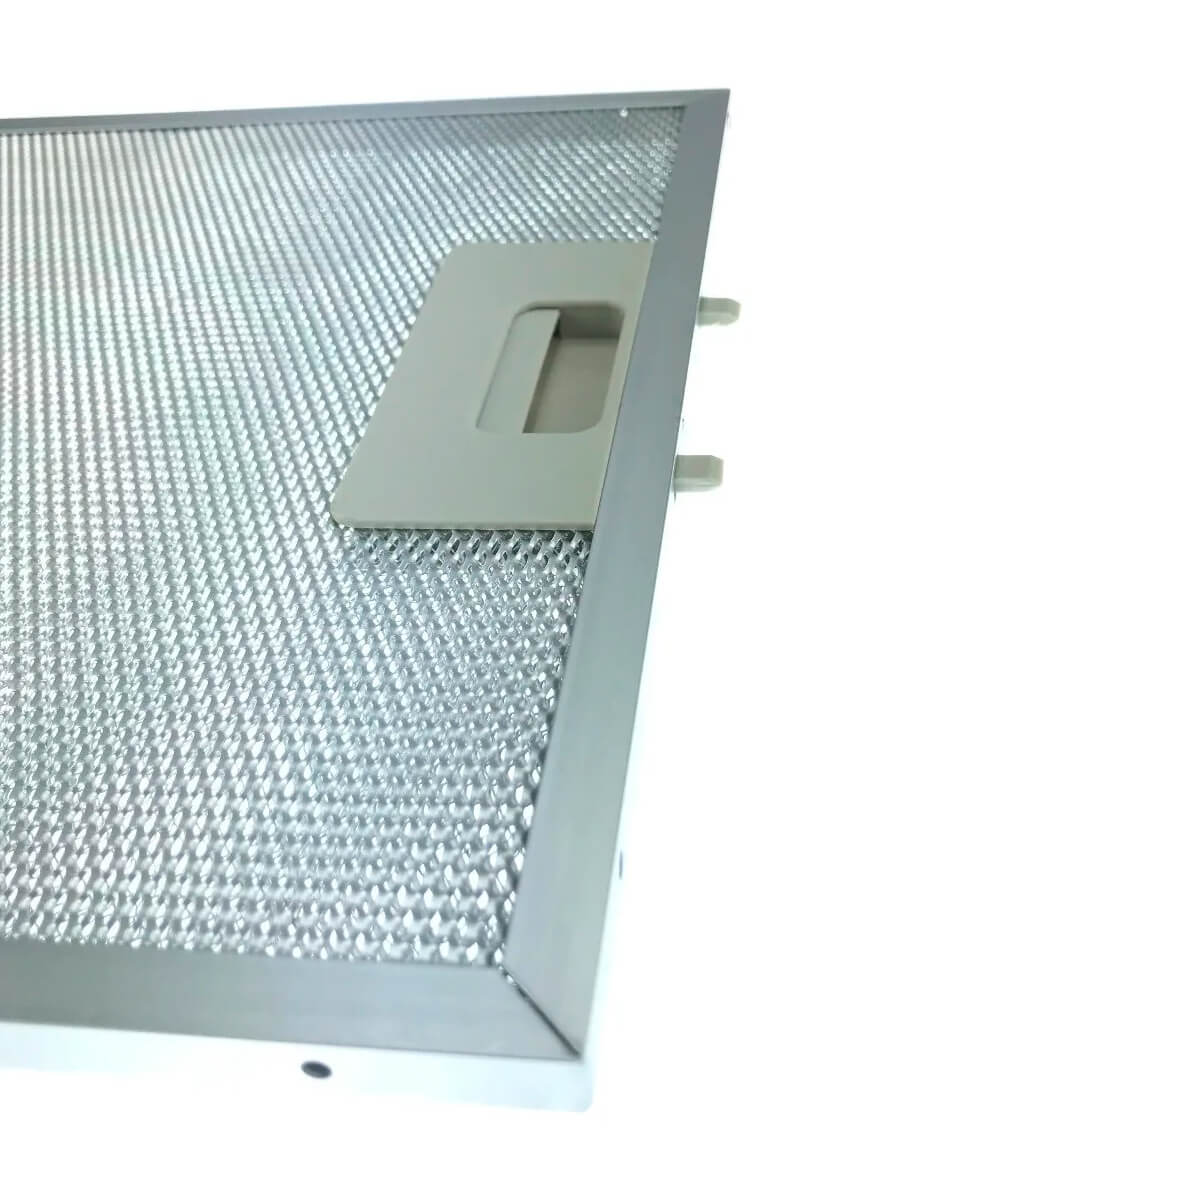 Filtro De Alumínio Para Coifa De Parede Electrolux 60CXS 90CTS 90CXS 60CTS - A13543601